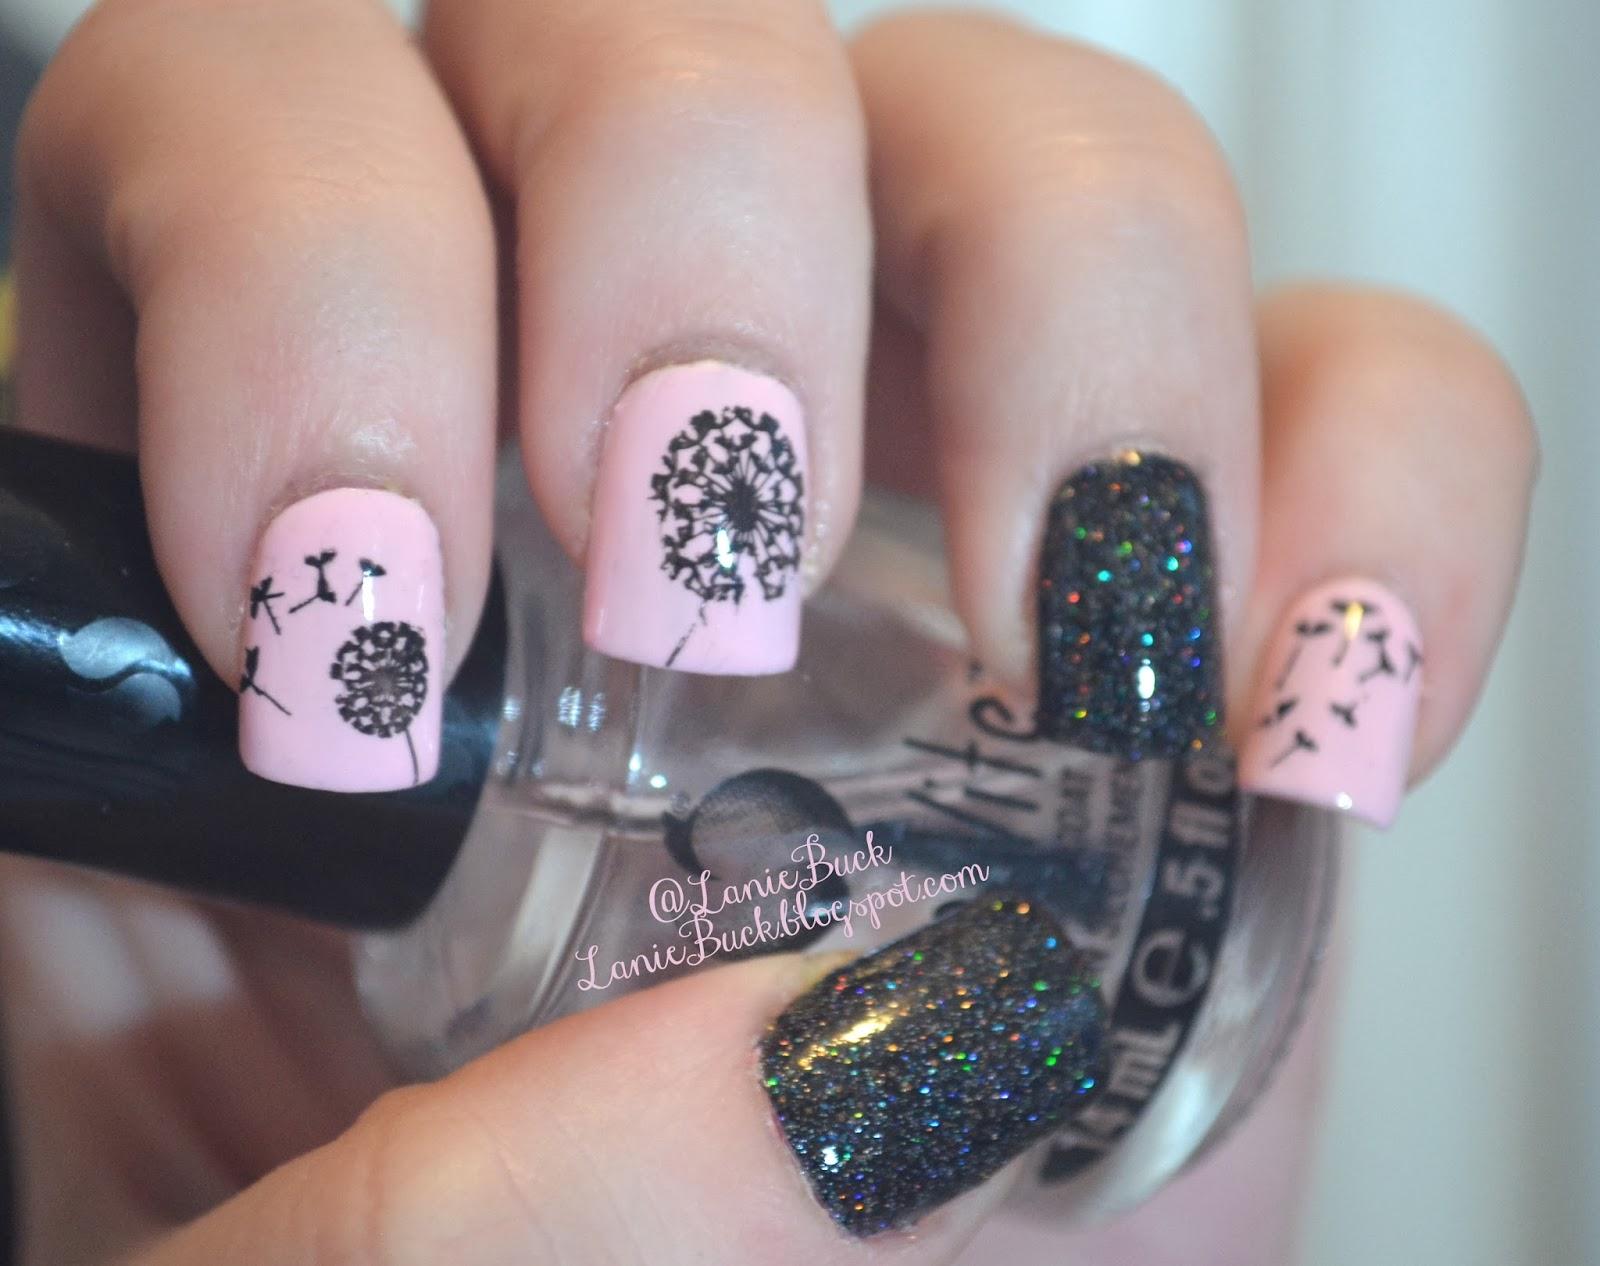 DIY Beauty- MoYou London Dandelion Nails